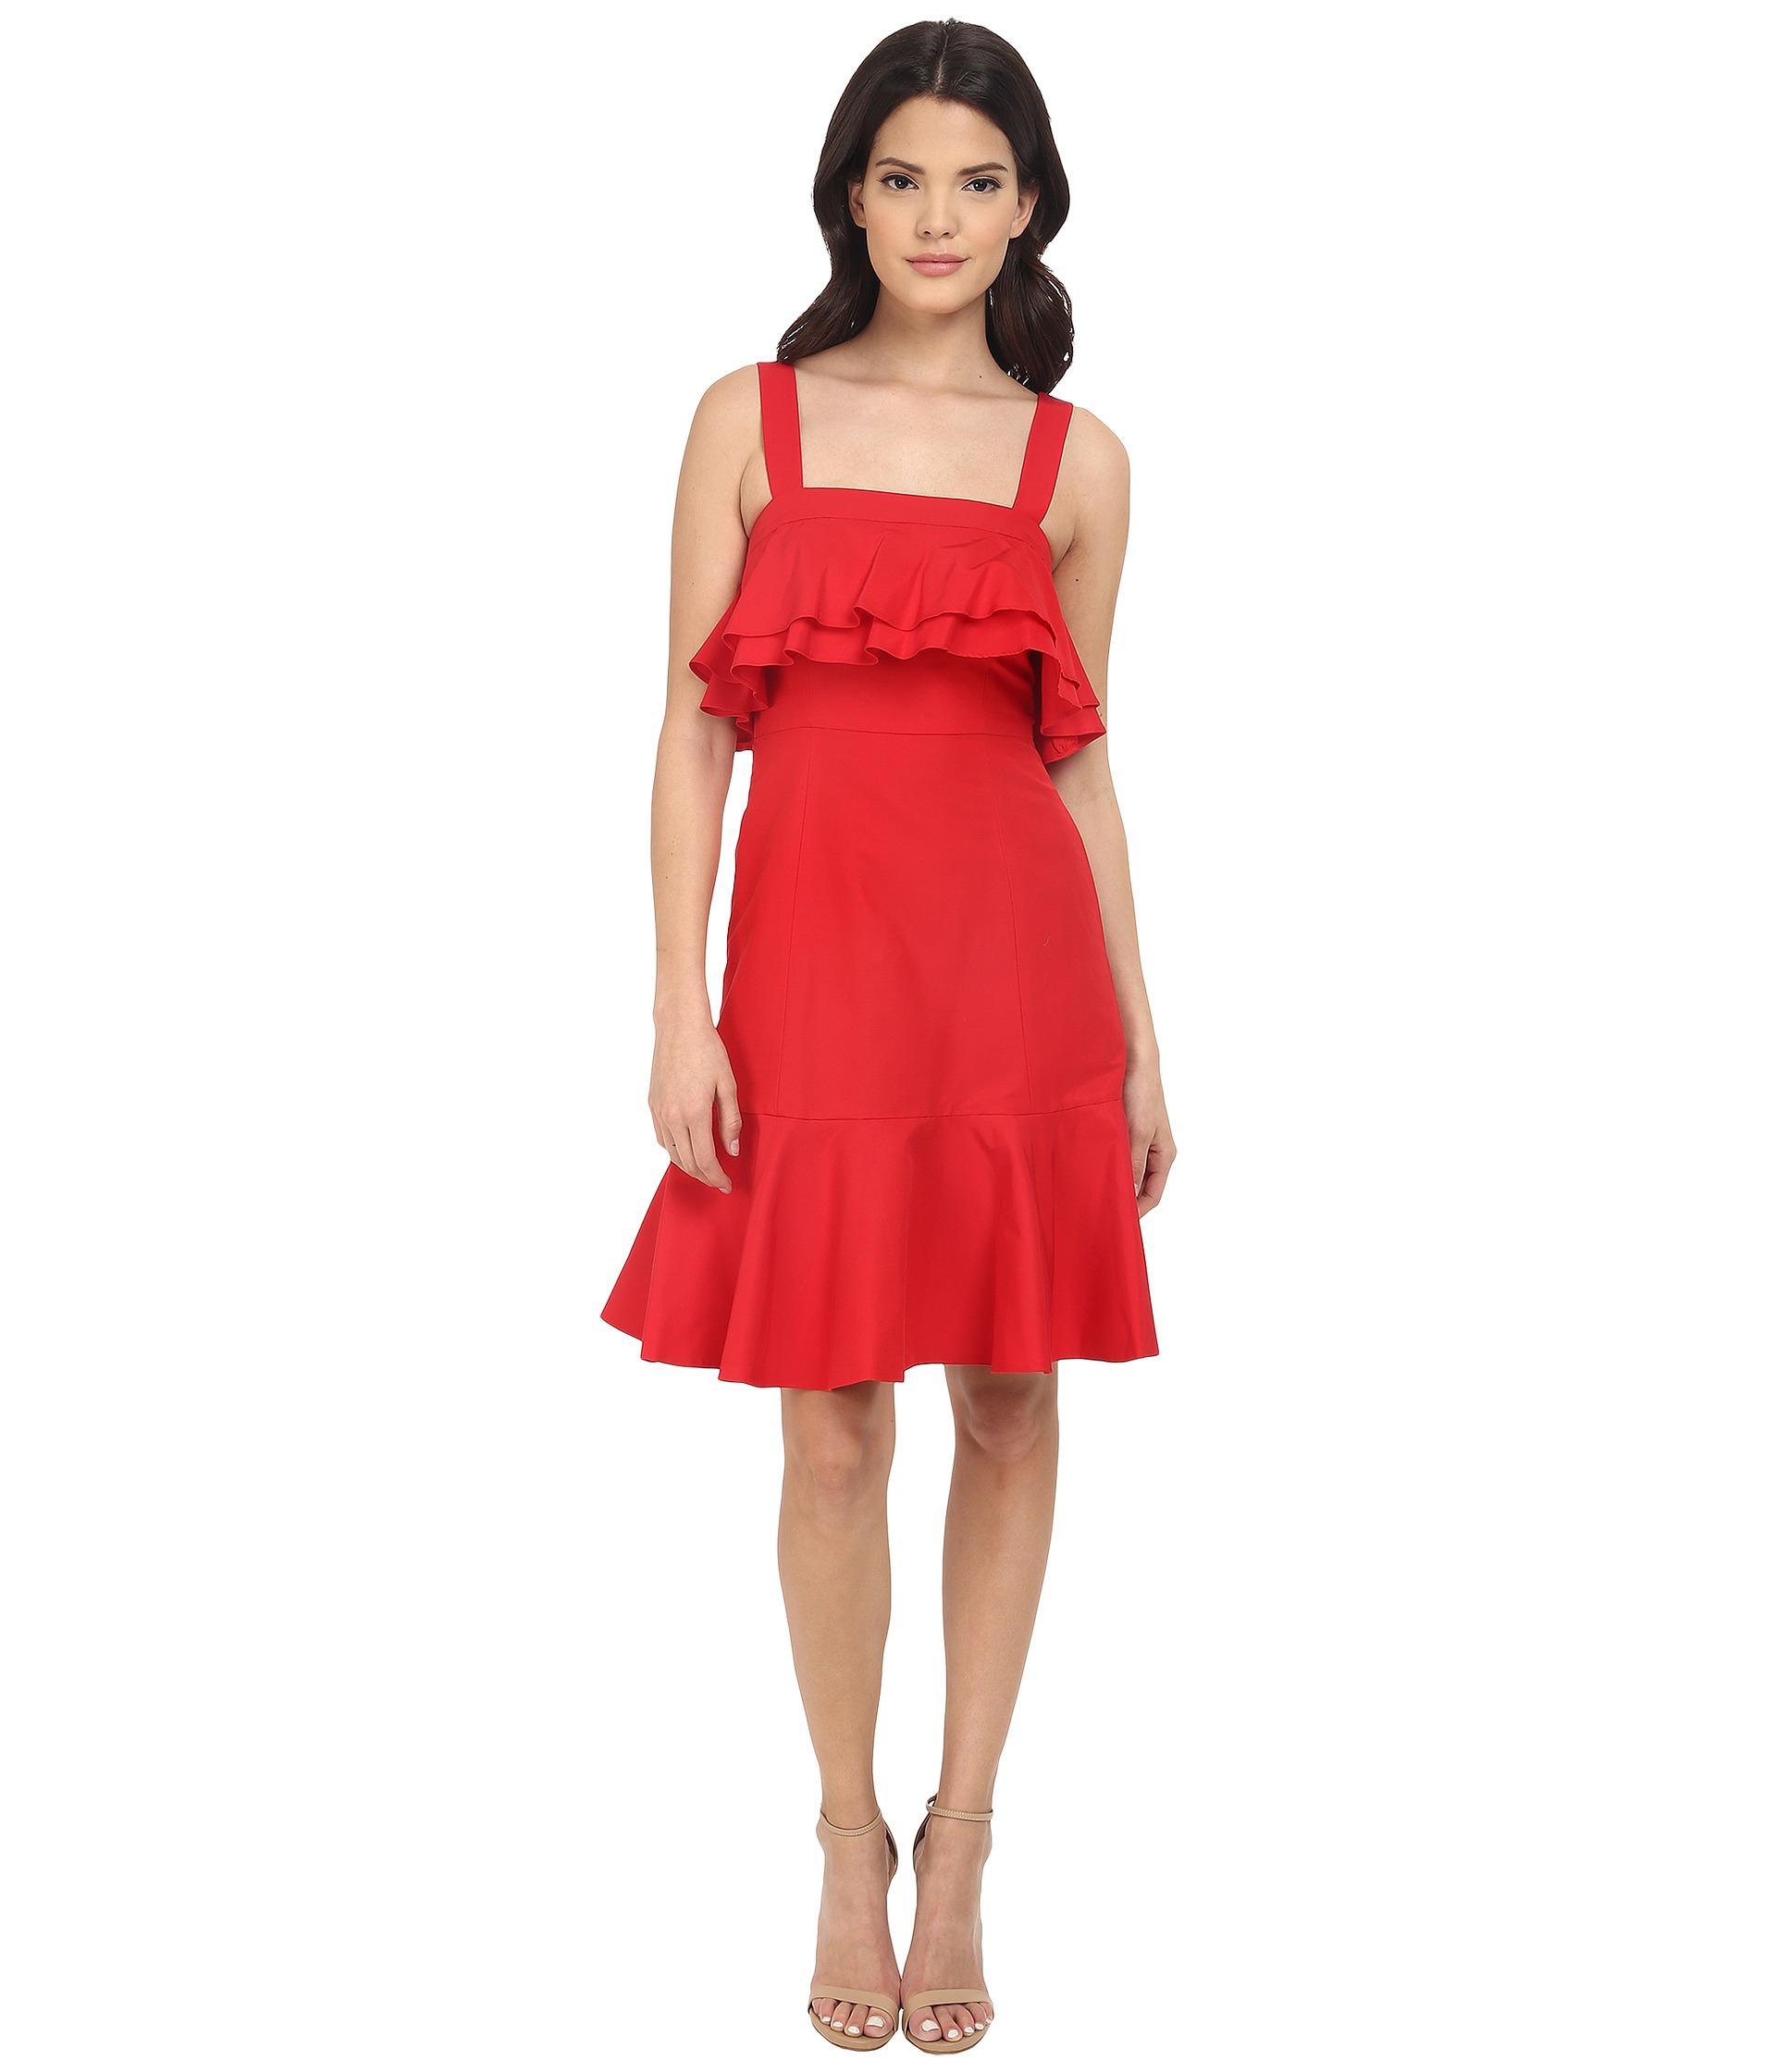 Jill stuart lace cotton sheath dress